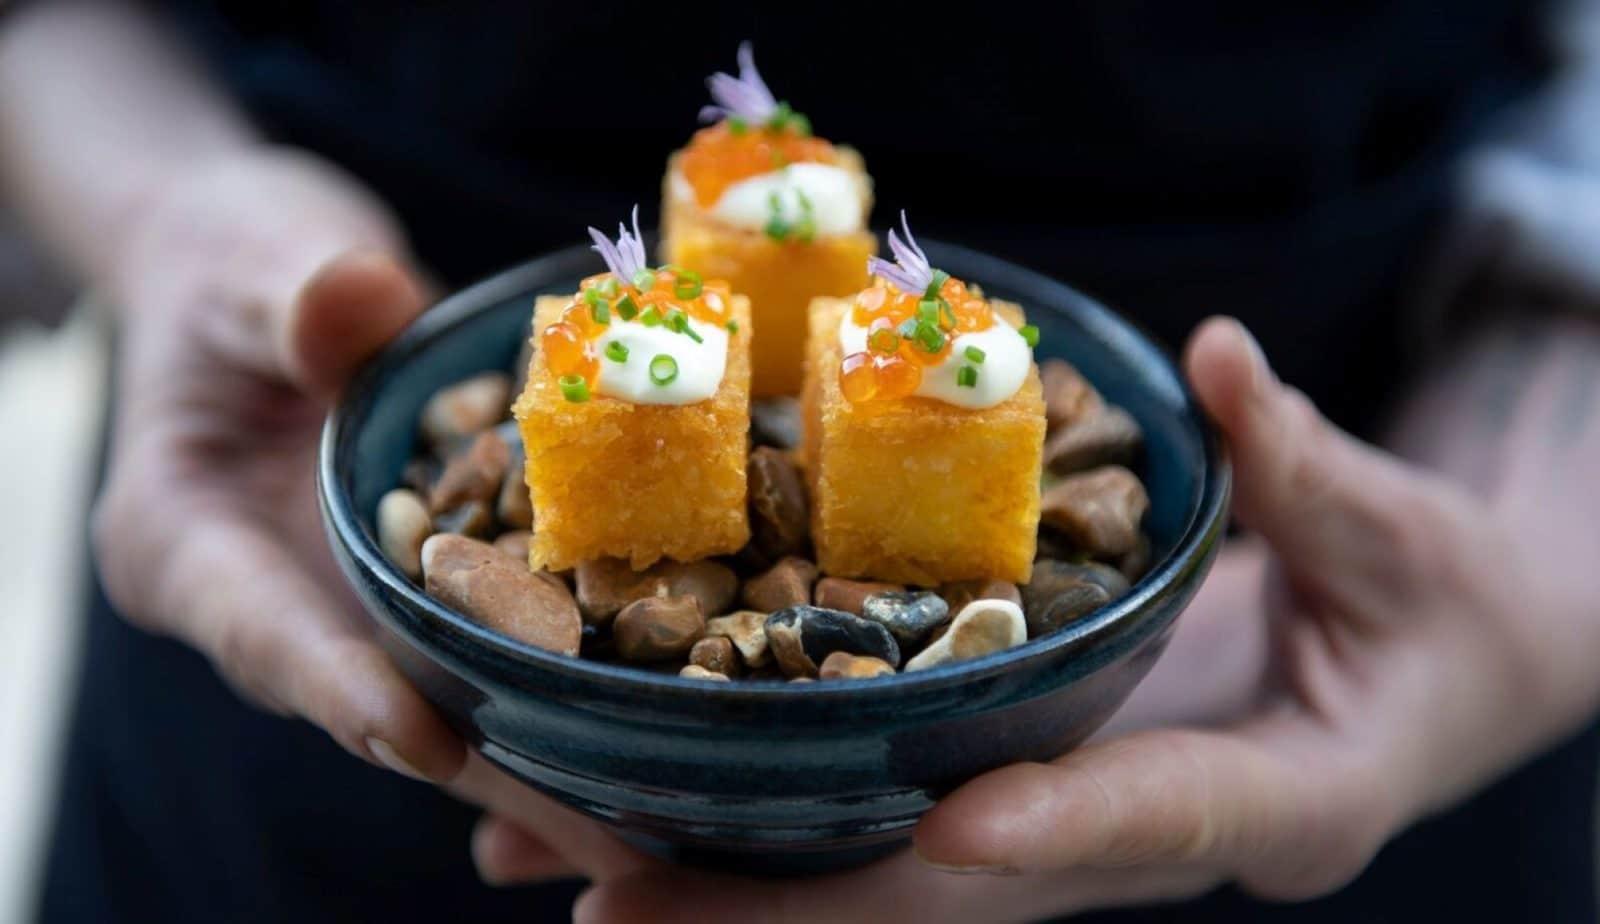 Kindling Restaurant Commis Chef Job